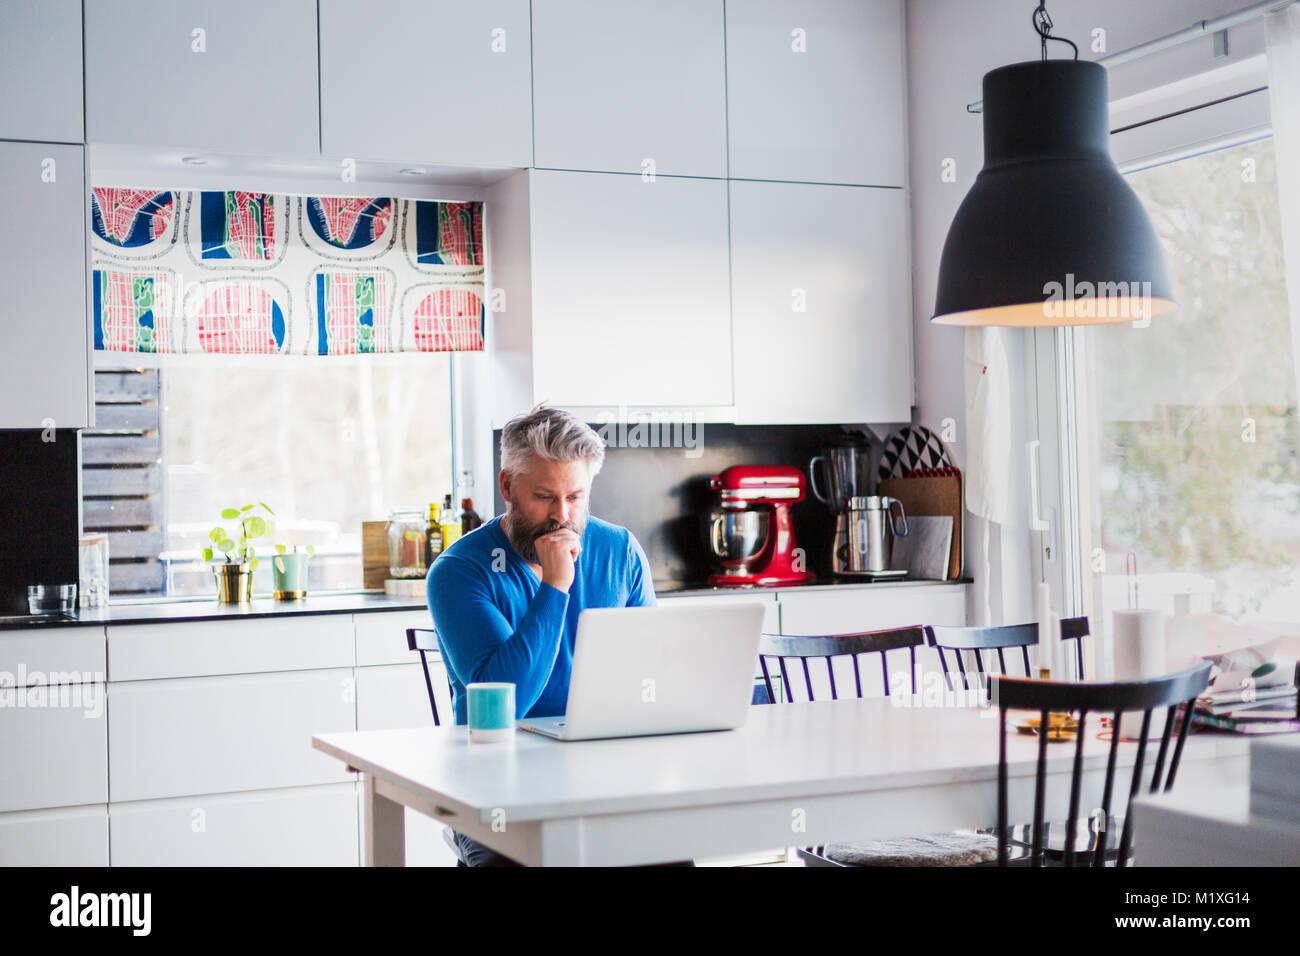 Man in kitchen Photo Stock